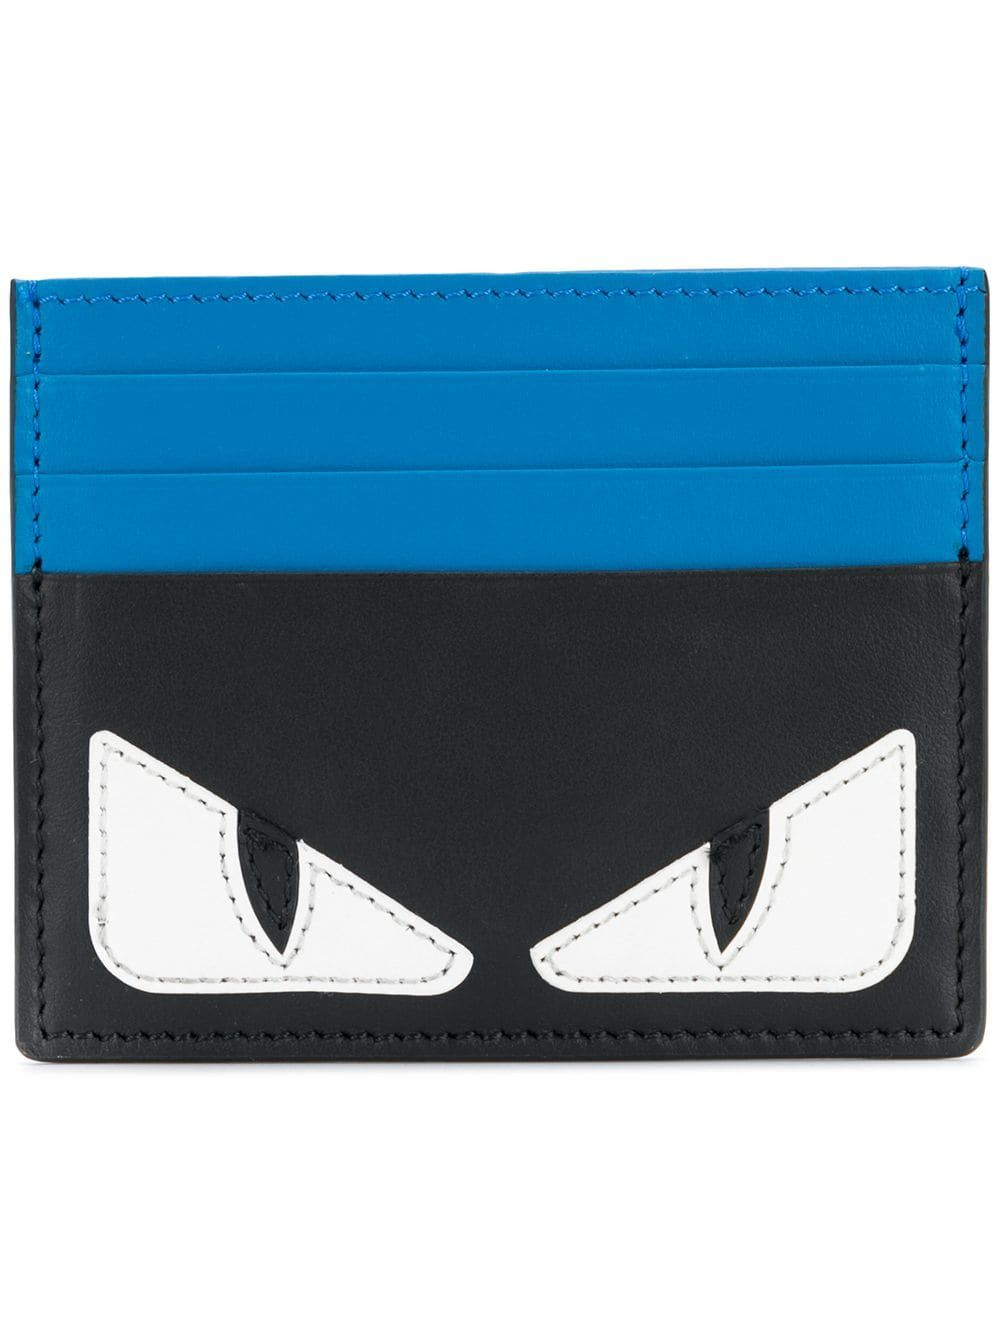 3139af37 Fendi Monster Eyes cardholder | wallets pouches , clutches ...